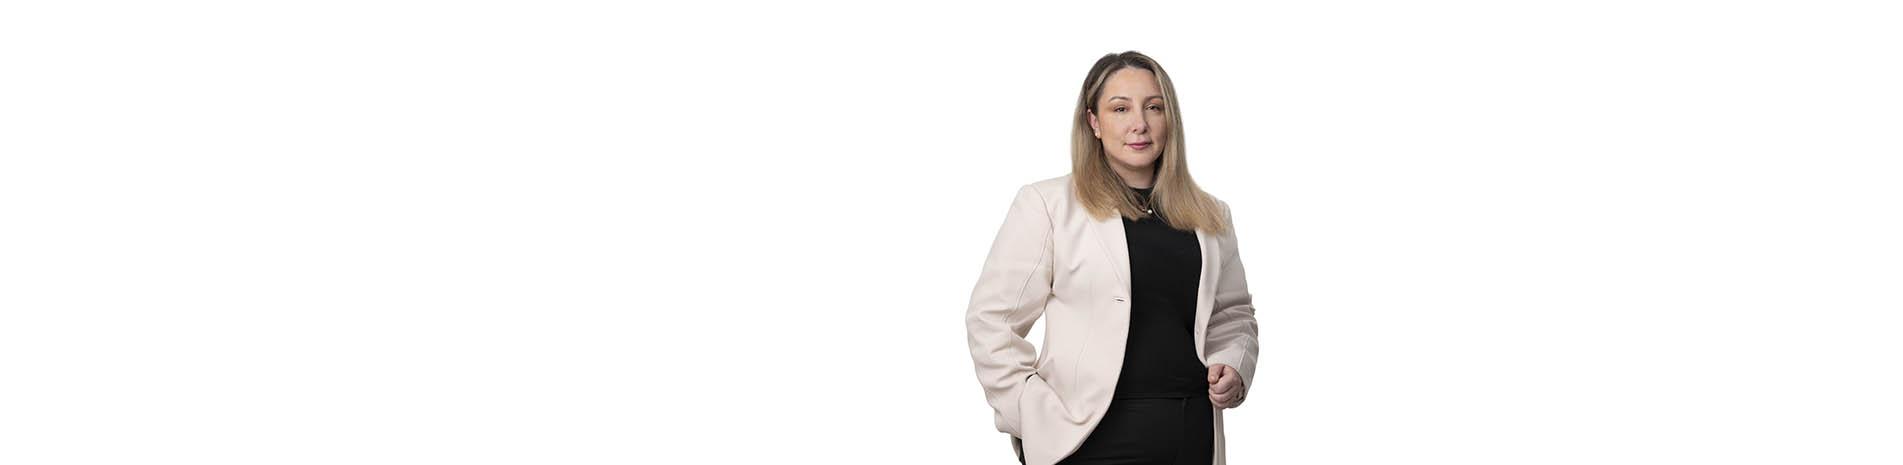 Jelena Adamovic Criminal Solicitor